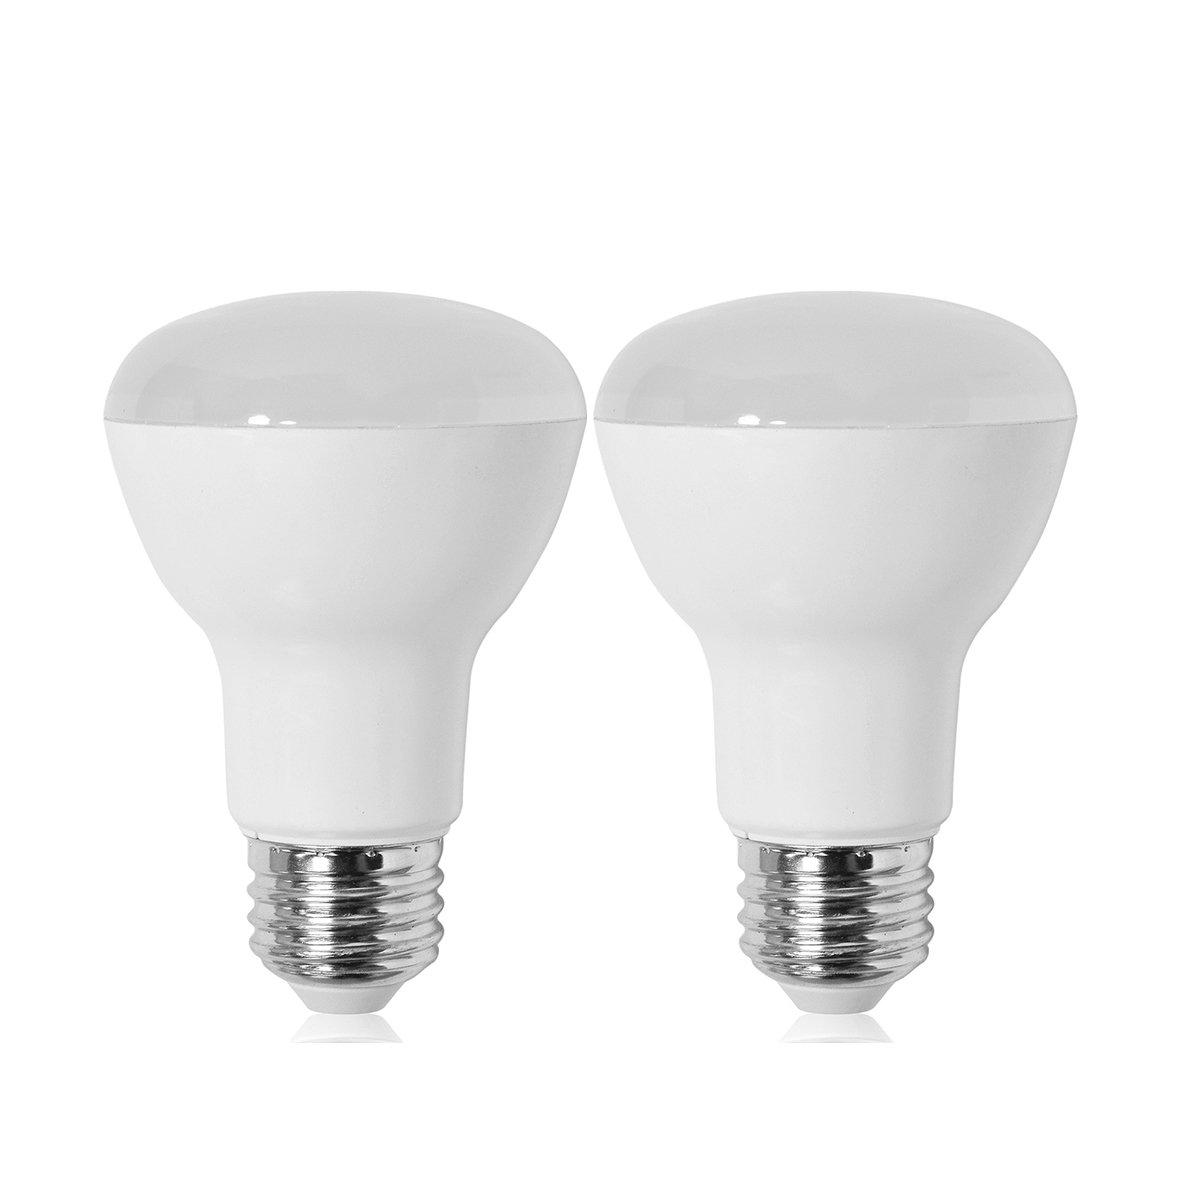 ,525 Lumens,UL-Listed Wide Flood R20 Light Bulb,120/° Beam Angle,Medium Base BR20 LED Bulb,Dimmable,7W ,2700K Soft White 50W equivalent E26